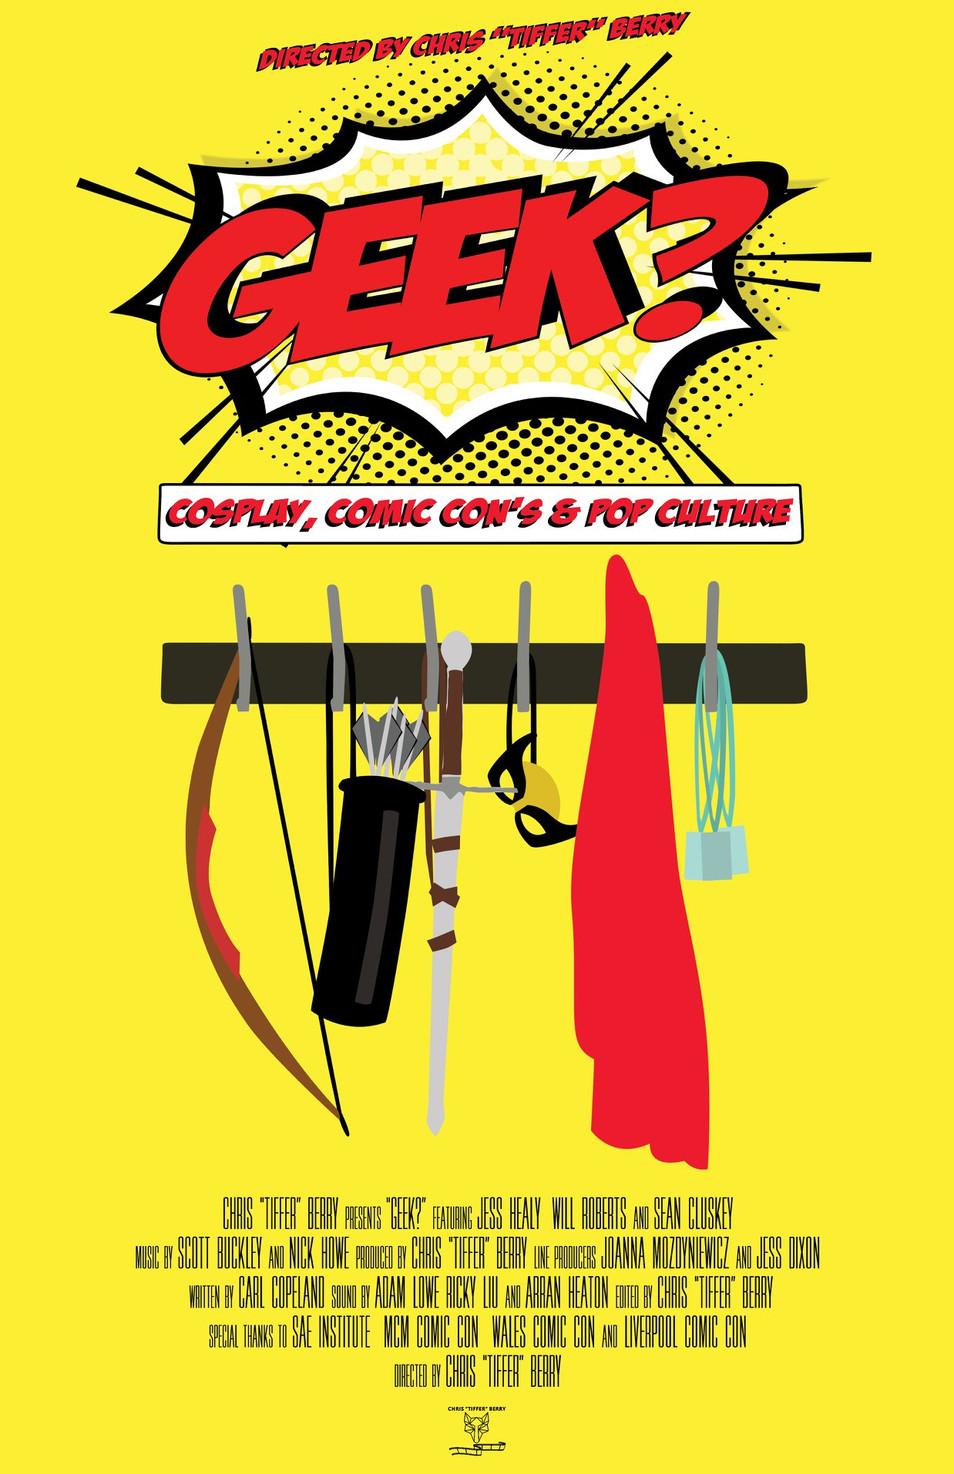 Geek? Cosplay, Comic Cons & Pop Culture